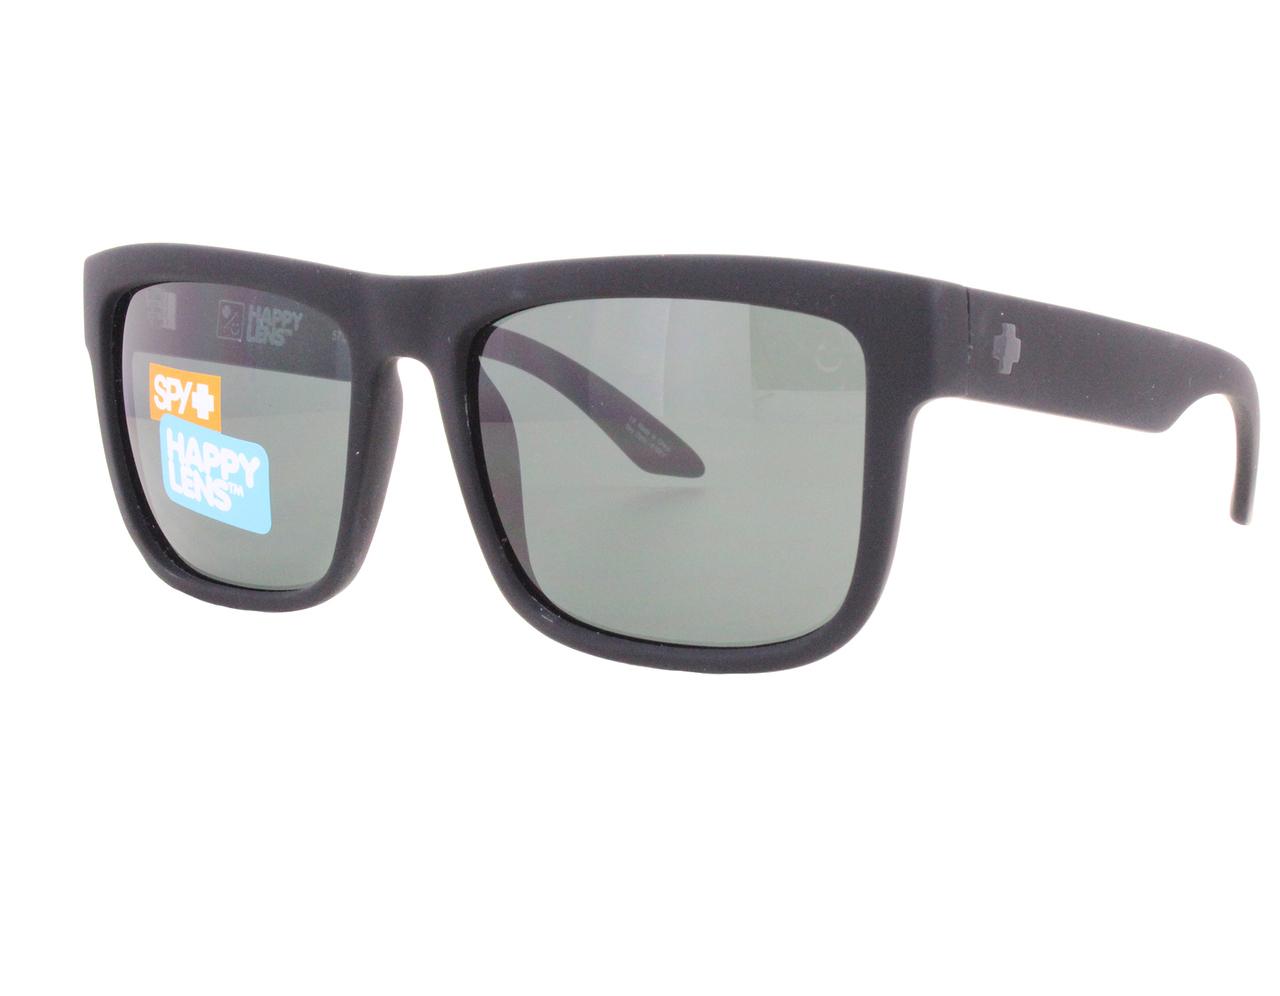 2dce110d5714d Details about New Spy DISCORD-673119973863 Soft Matte Black   Happy Gray  Green Sunglasses